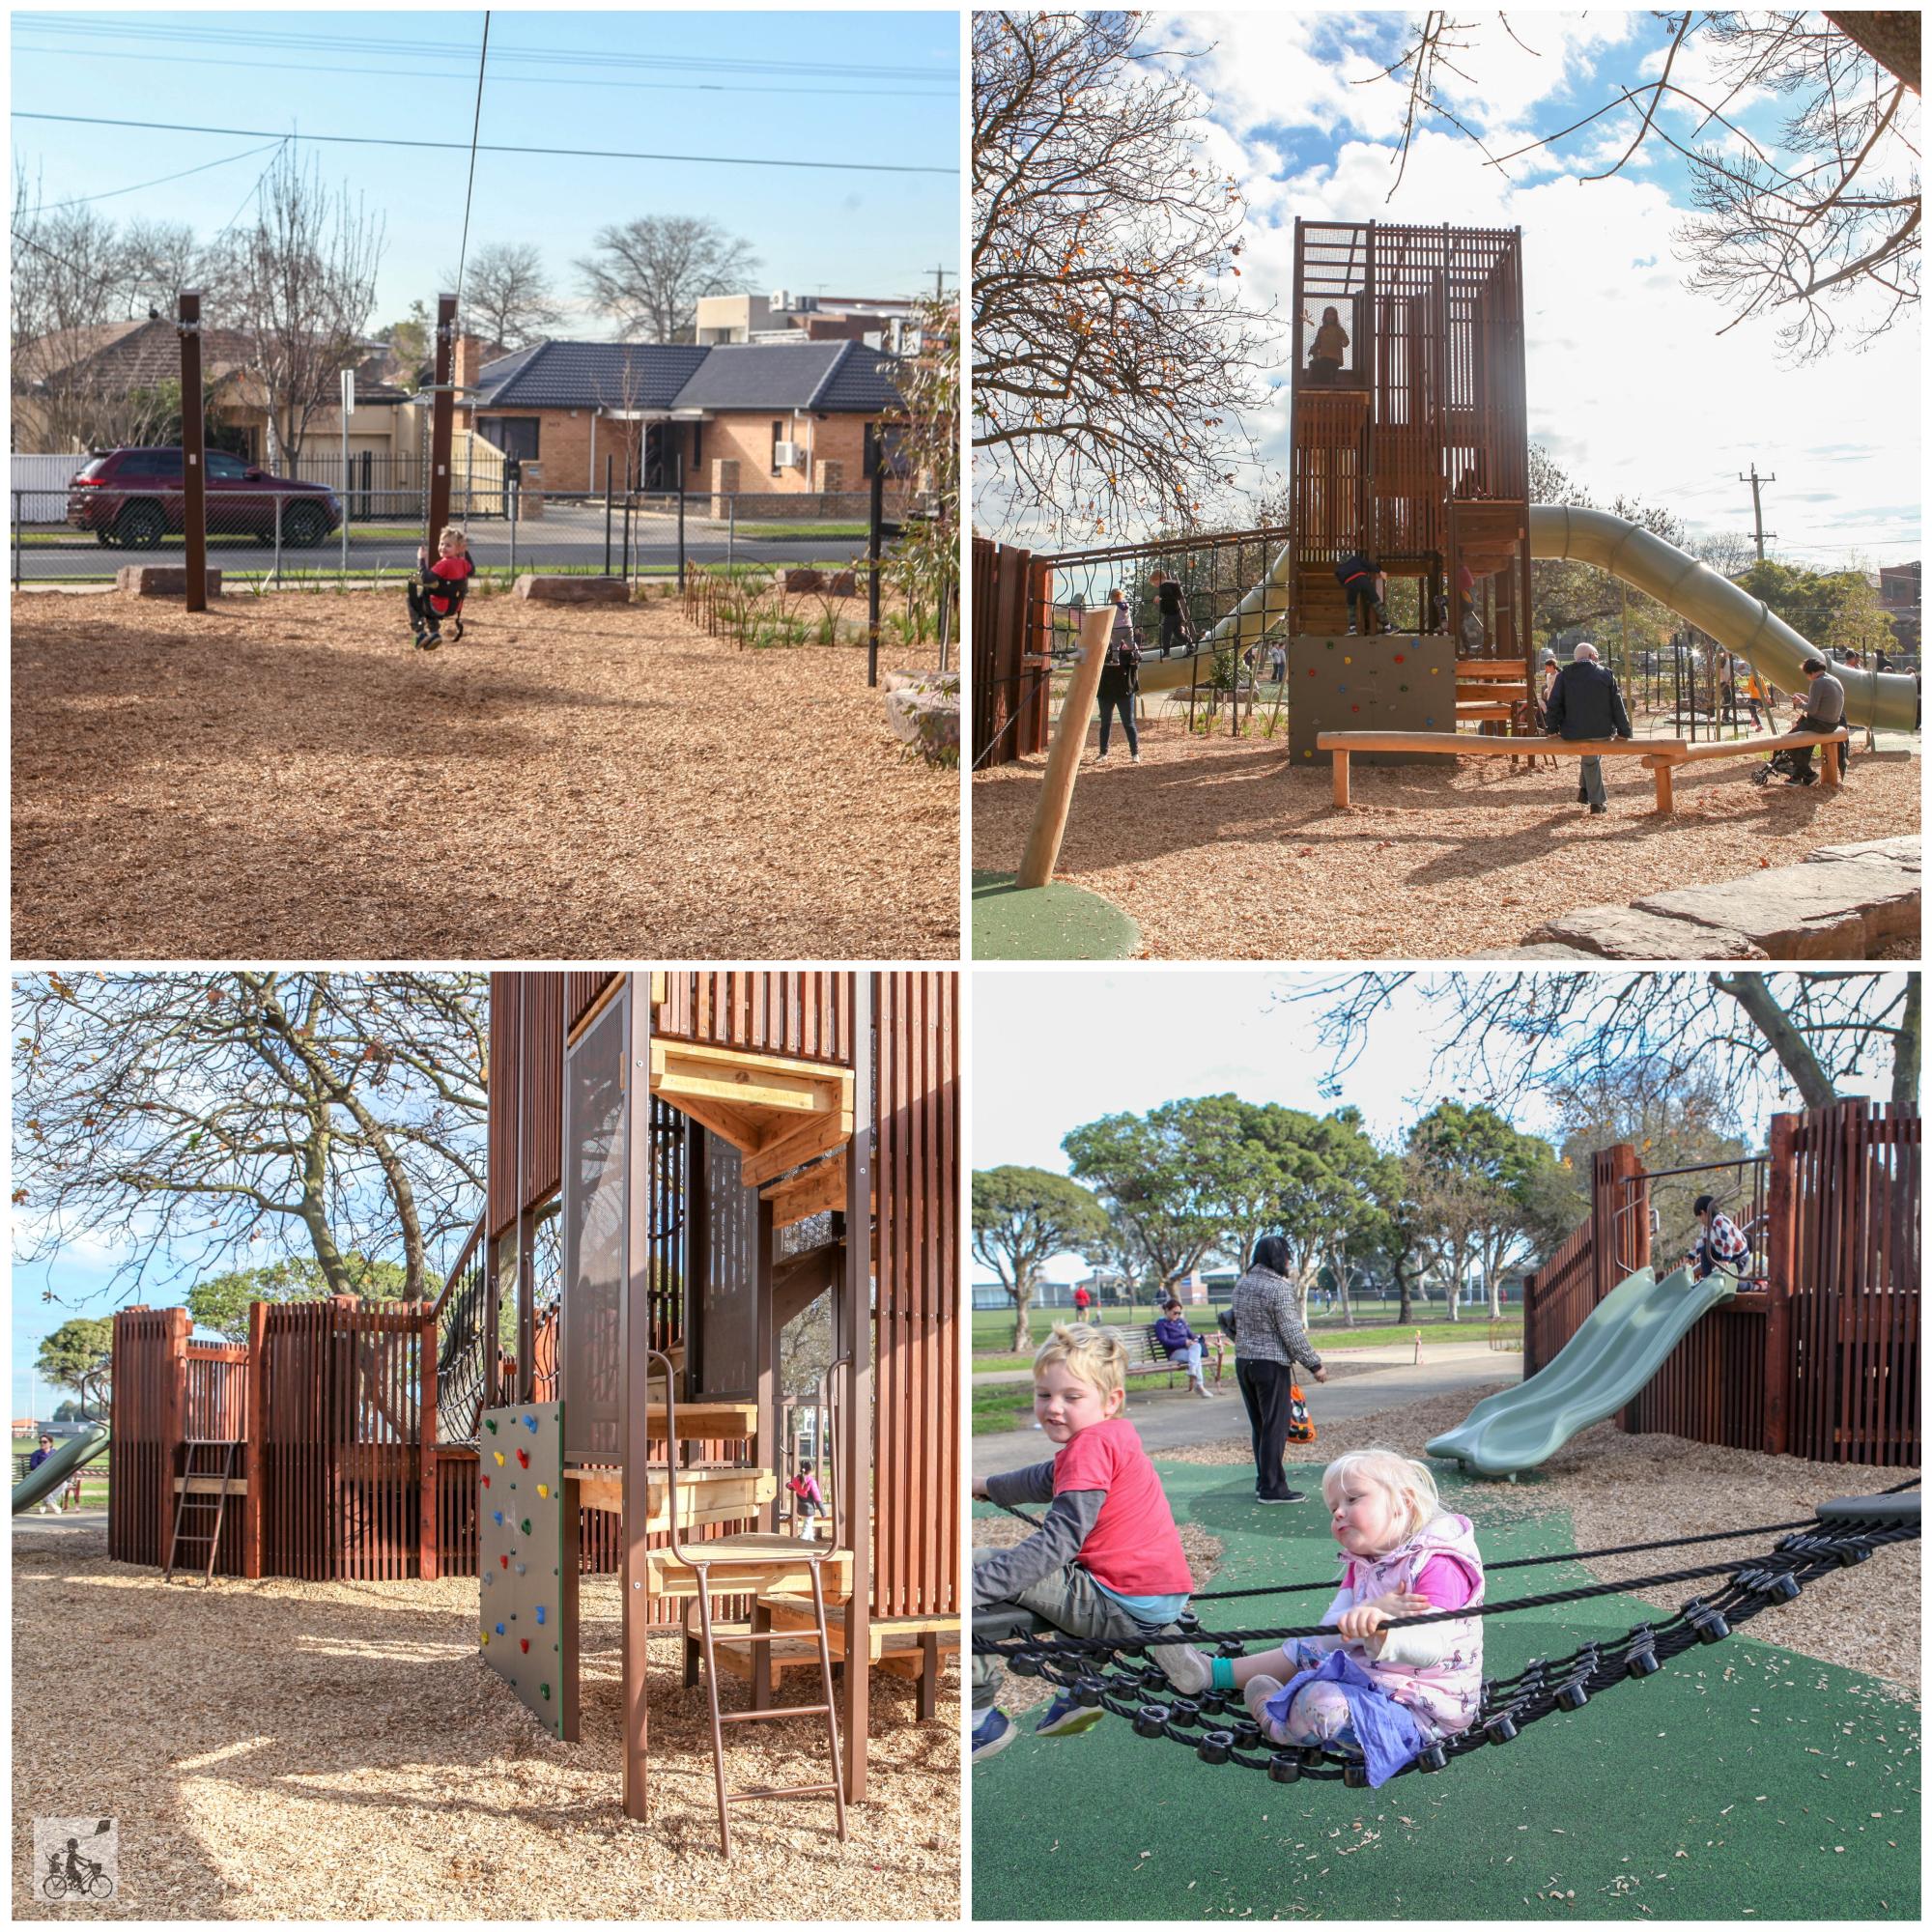 mamma knows south - mckinnon reserve playground, mckinnon